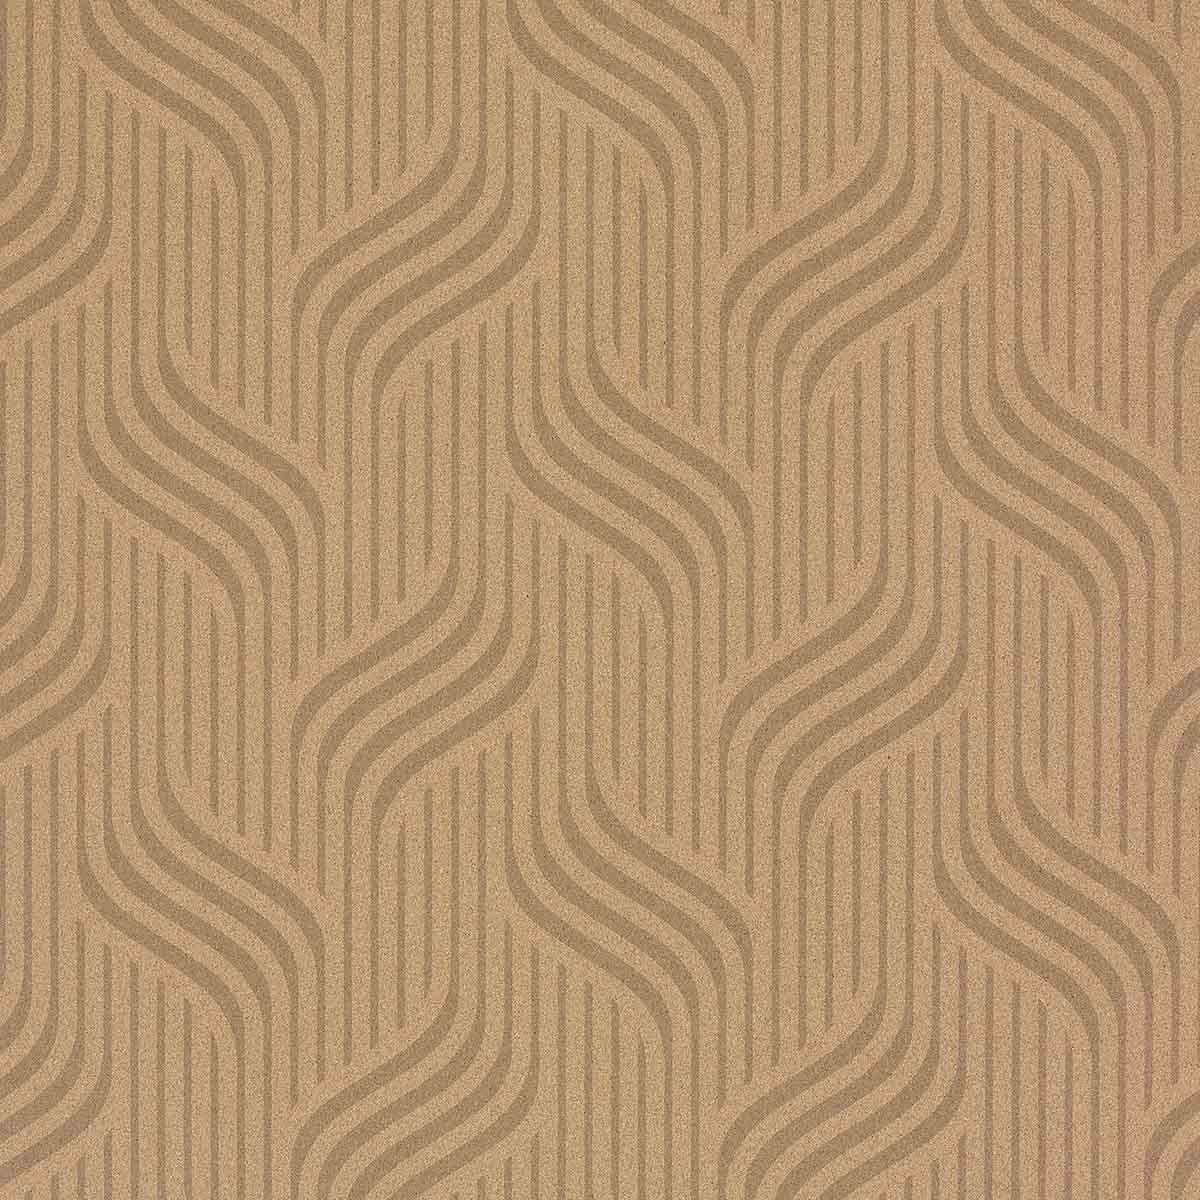 Decorative cork thin paper Urban Nature 01.01